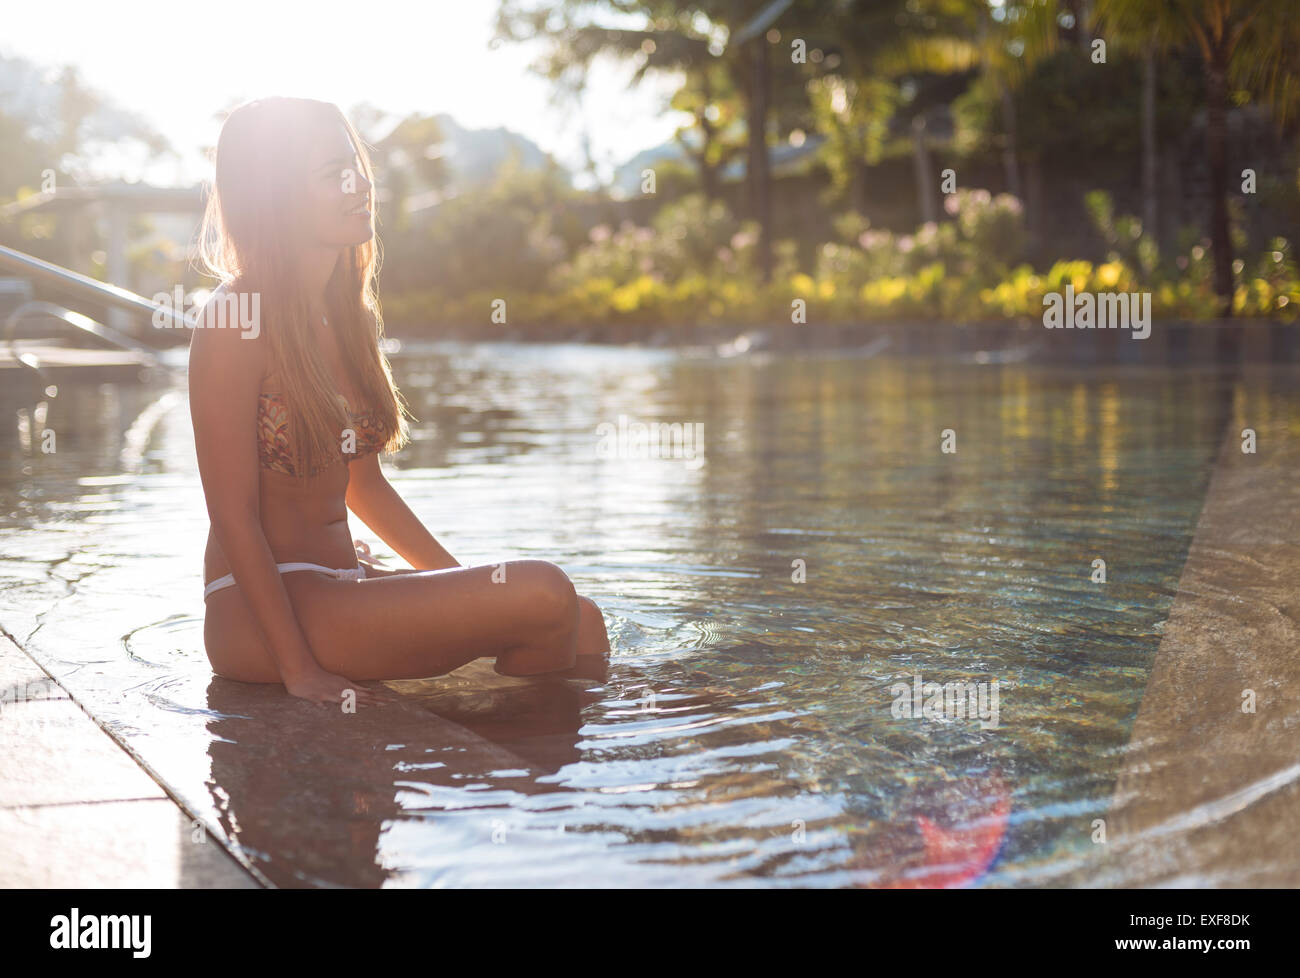 Young woman in bikini sitting in swimming pool, Panay Island, Visayas, Philippines - Stock Image